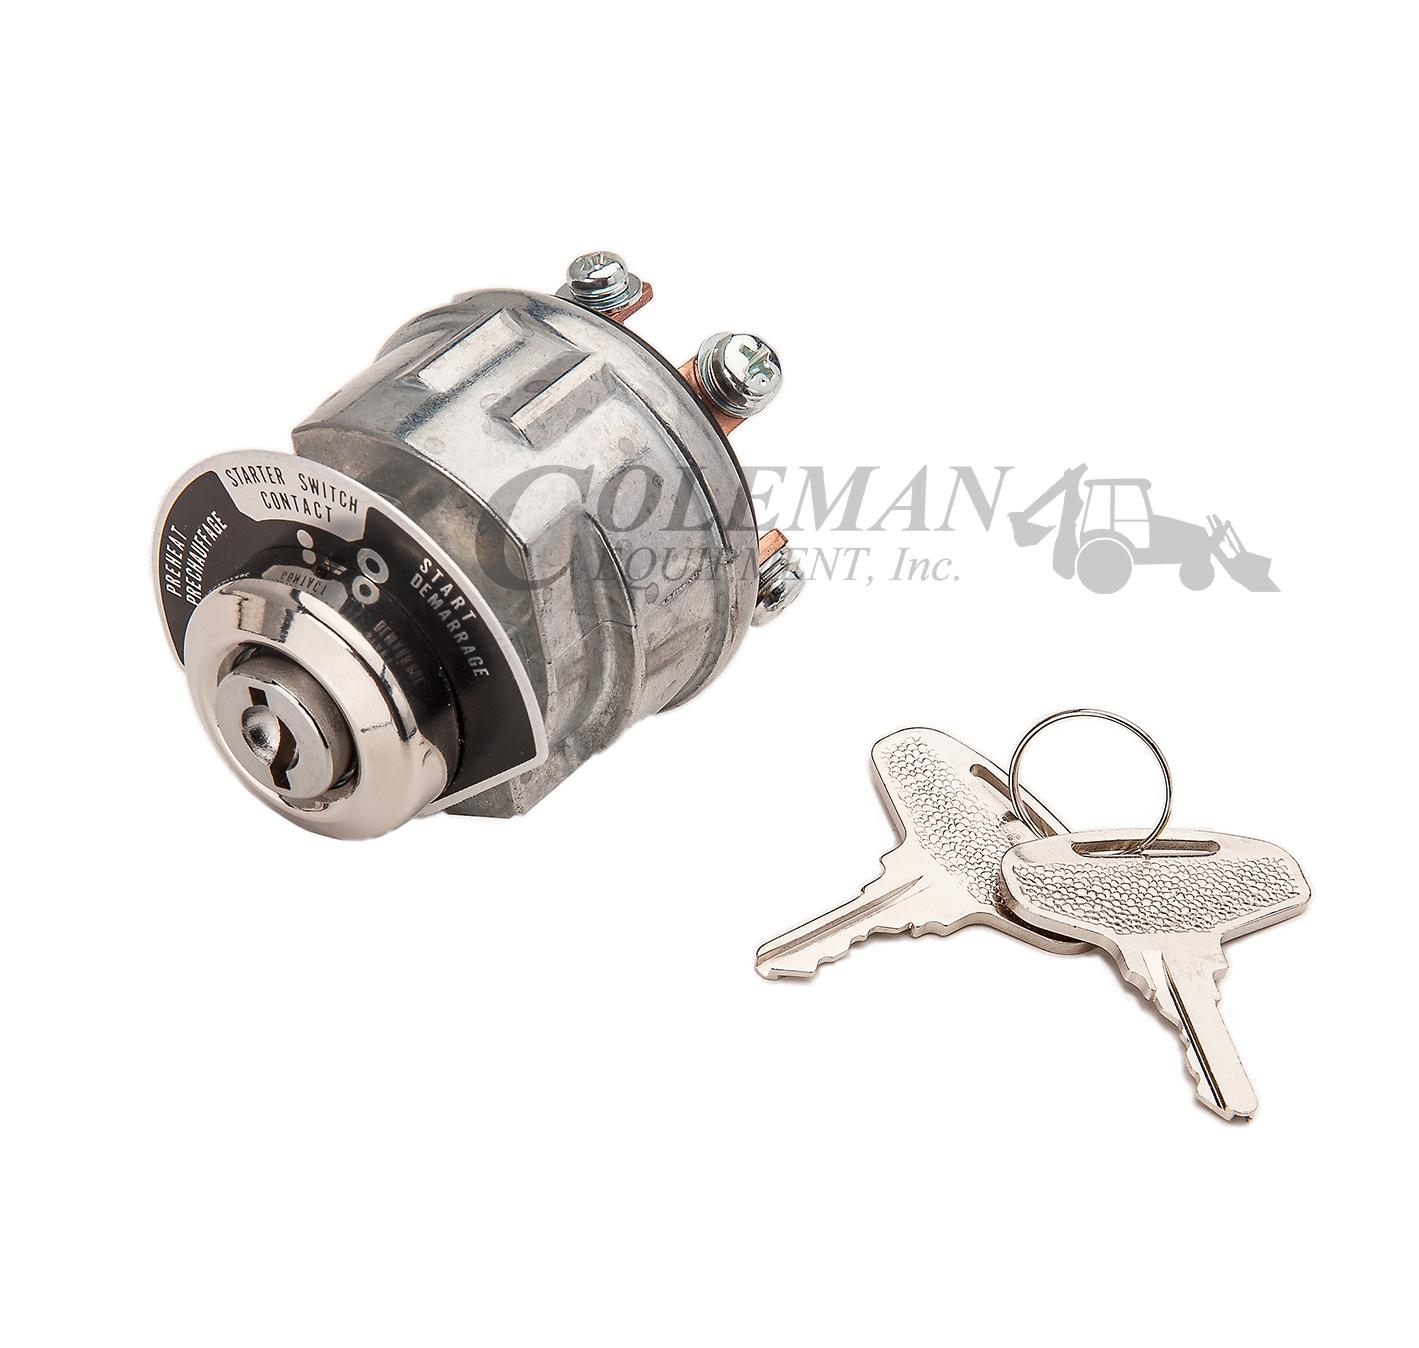 hight resolution of  wiring diagram for kubota b on kubota starter switch and keys 66706 55120 coleman equipment on